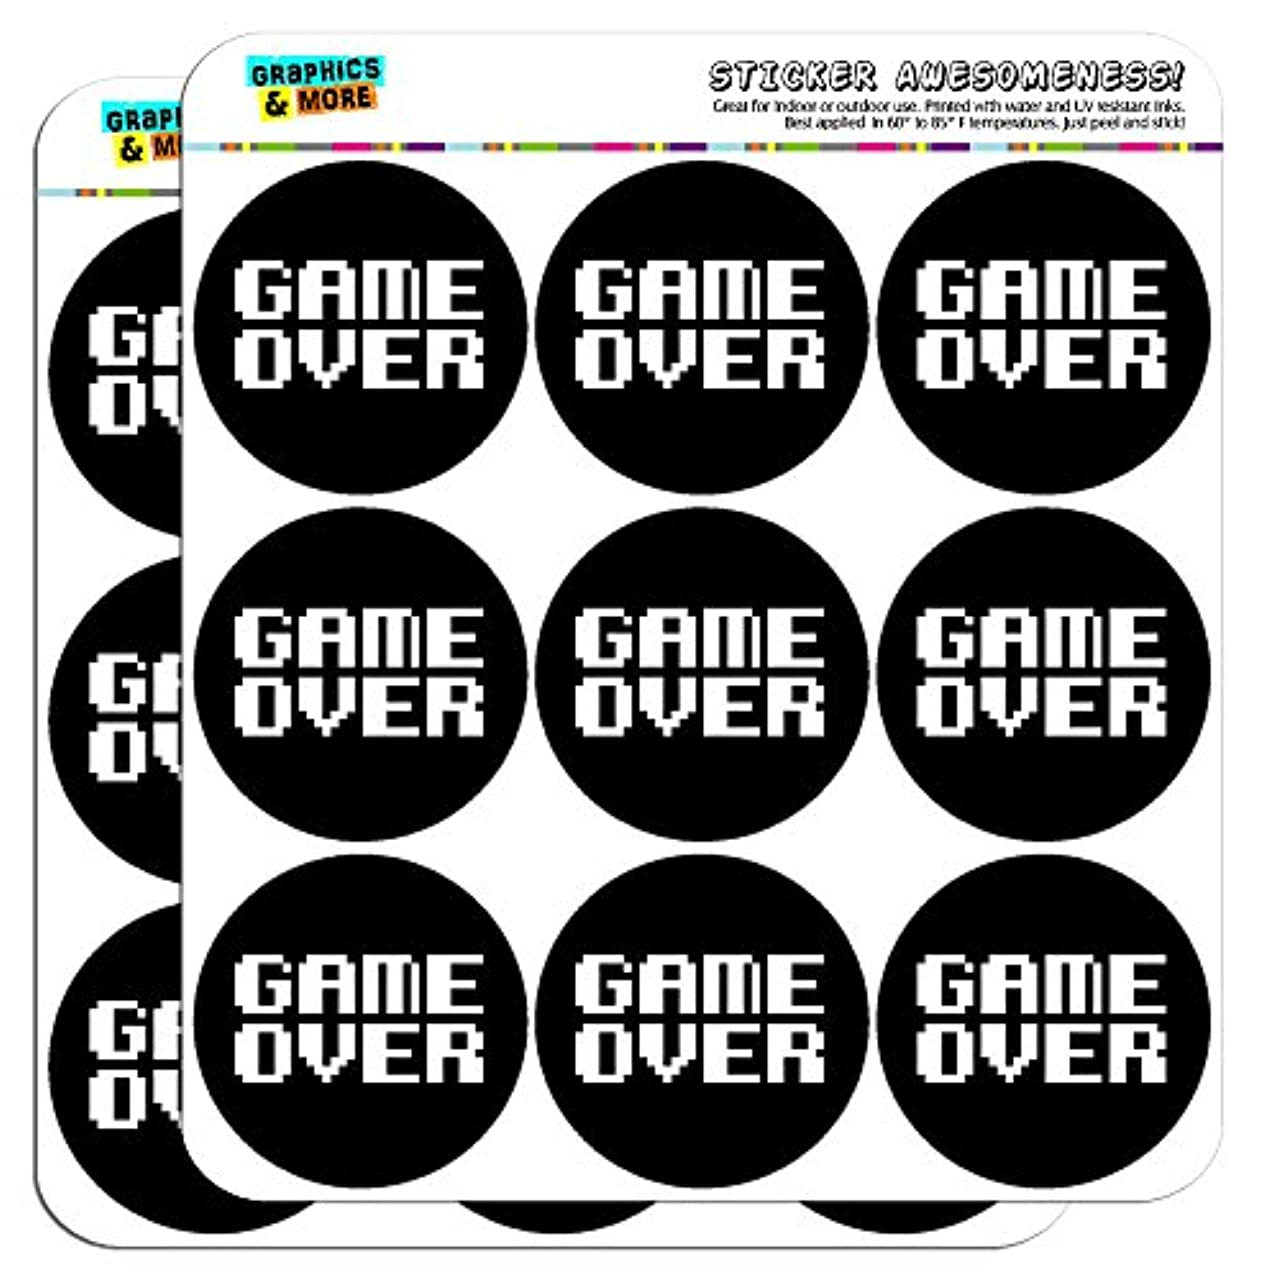 Game Over Gamer Pixel Font Geek 2